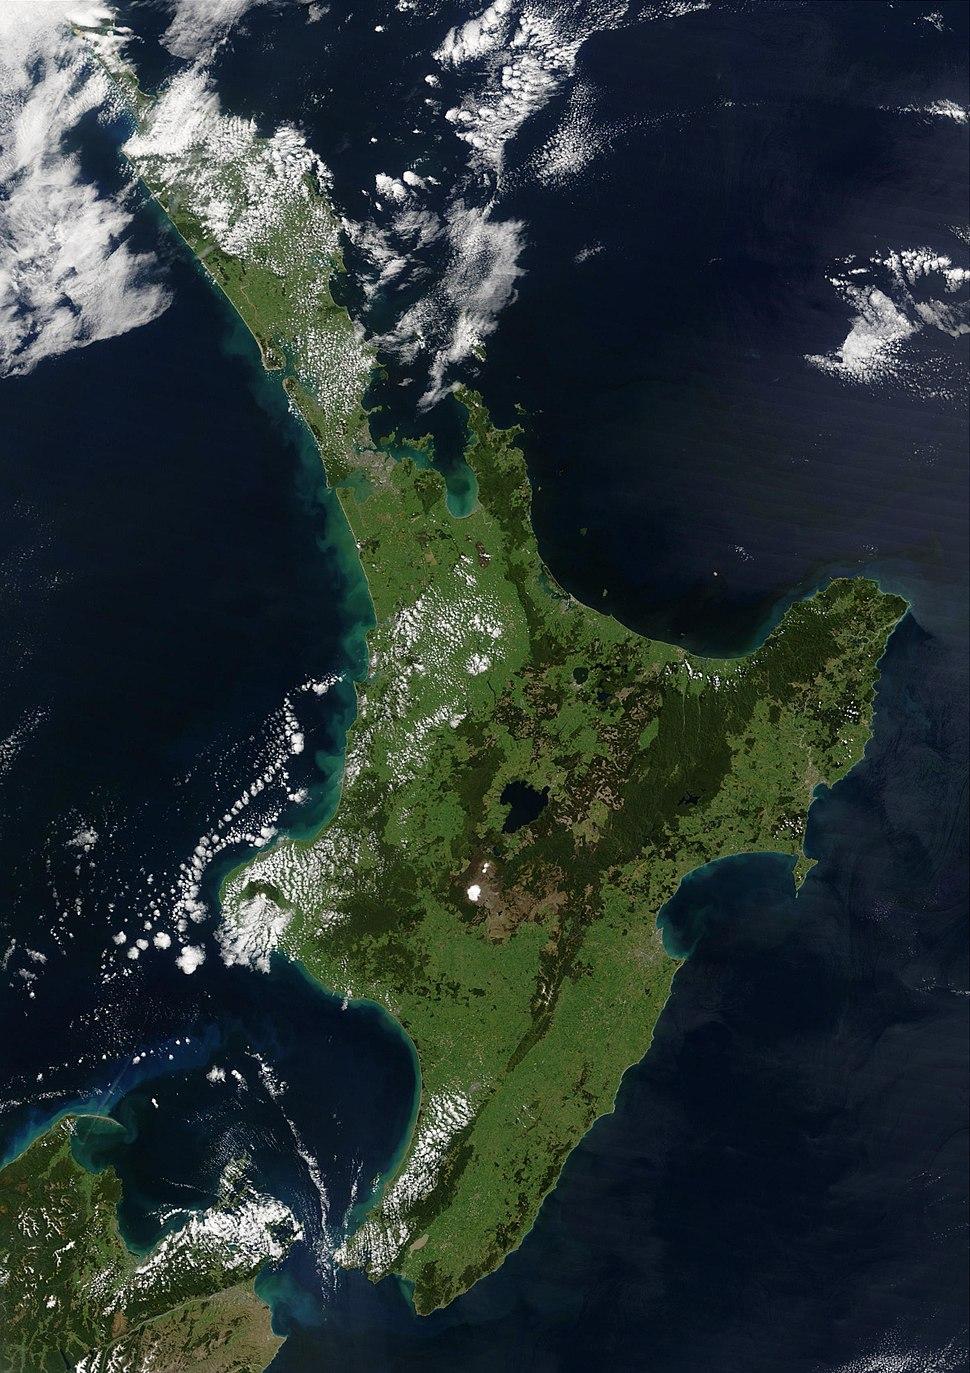 NewZealand.A2002296.2220.250m North Island crop